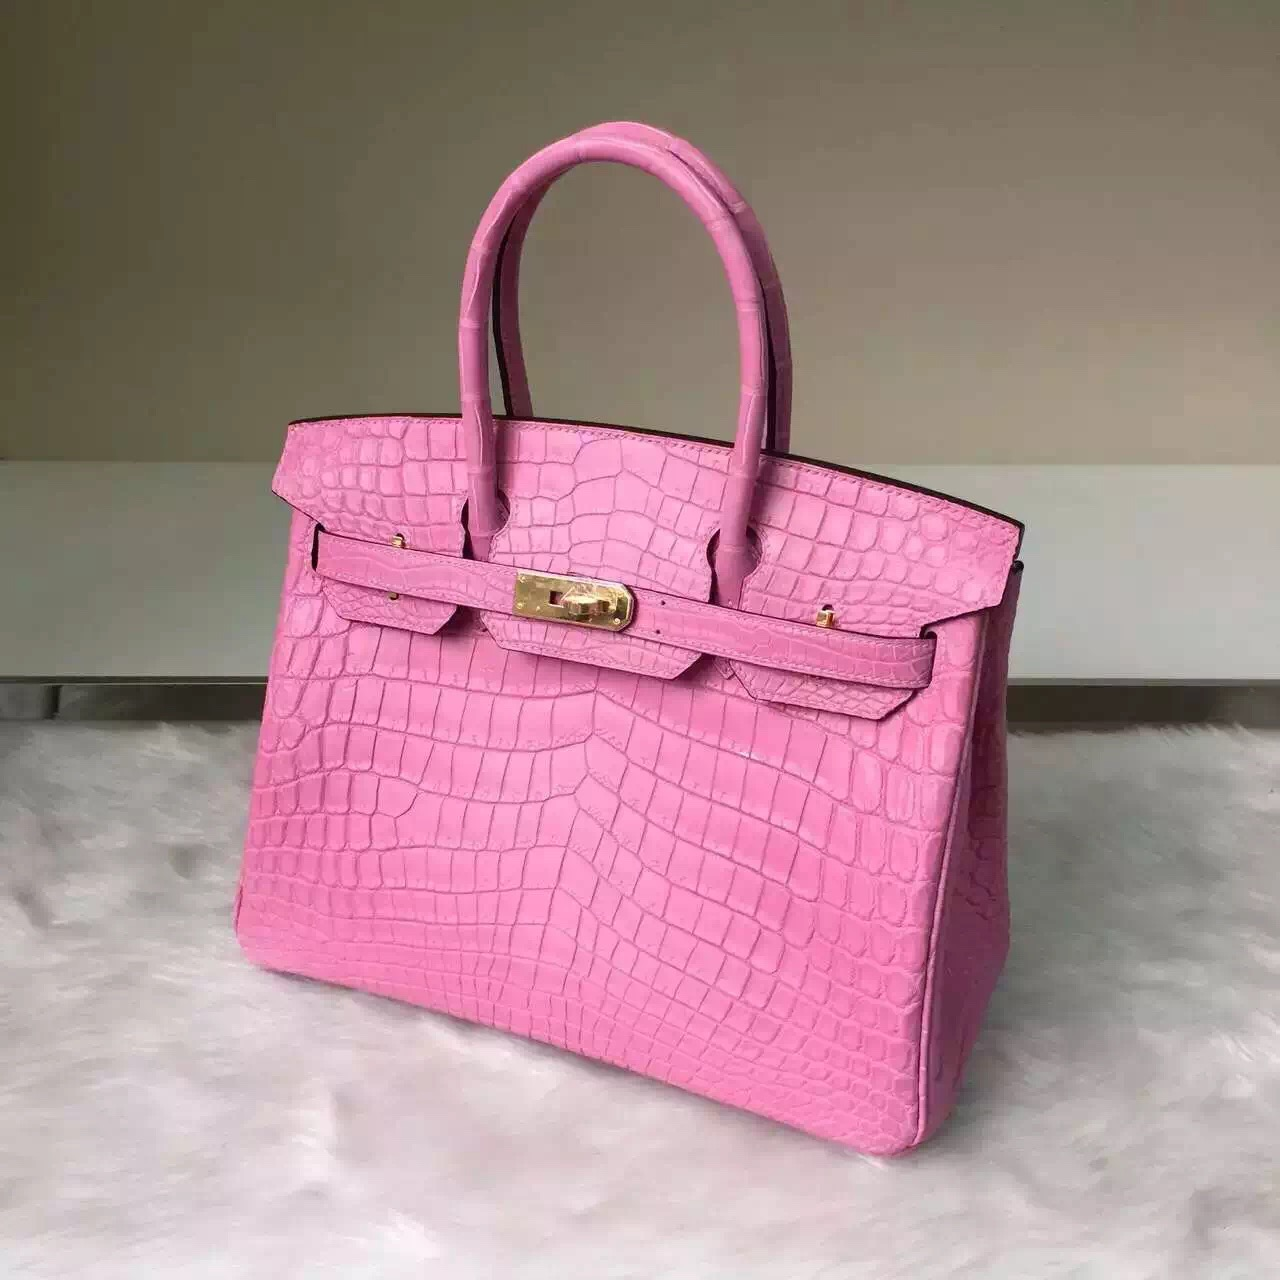 Online Store Hermes Matt Crocodile Leather Birkin30 Bag in Sakura Pink